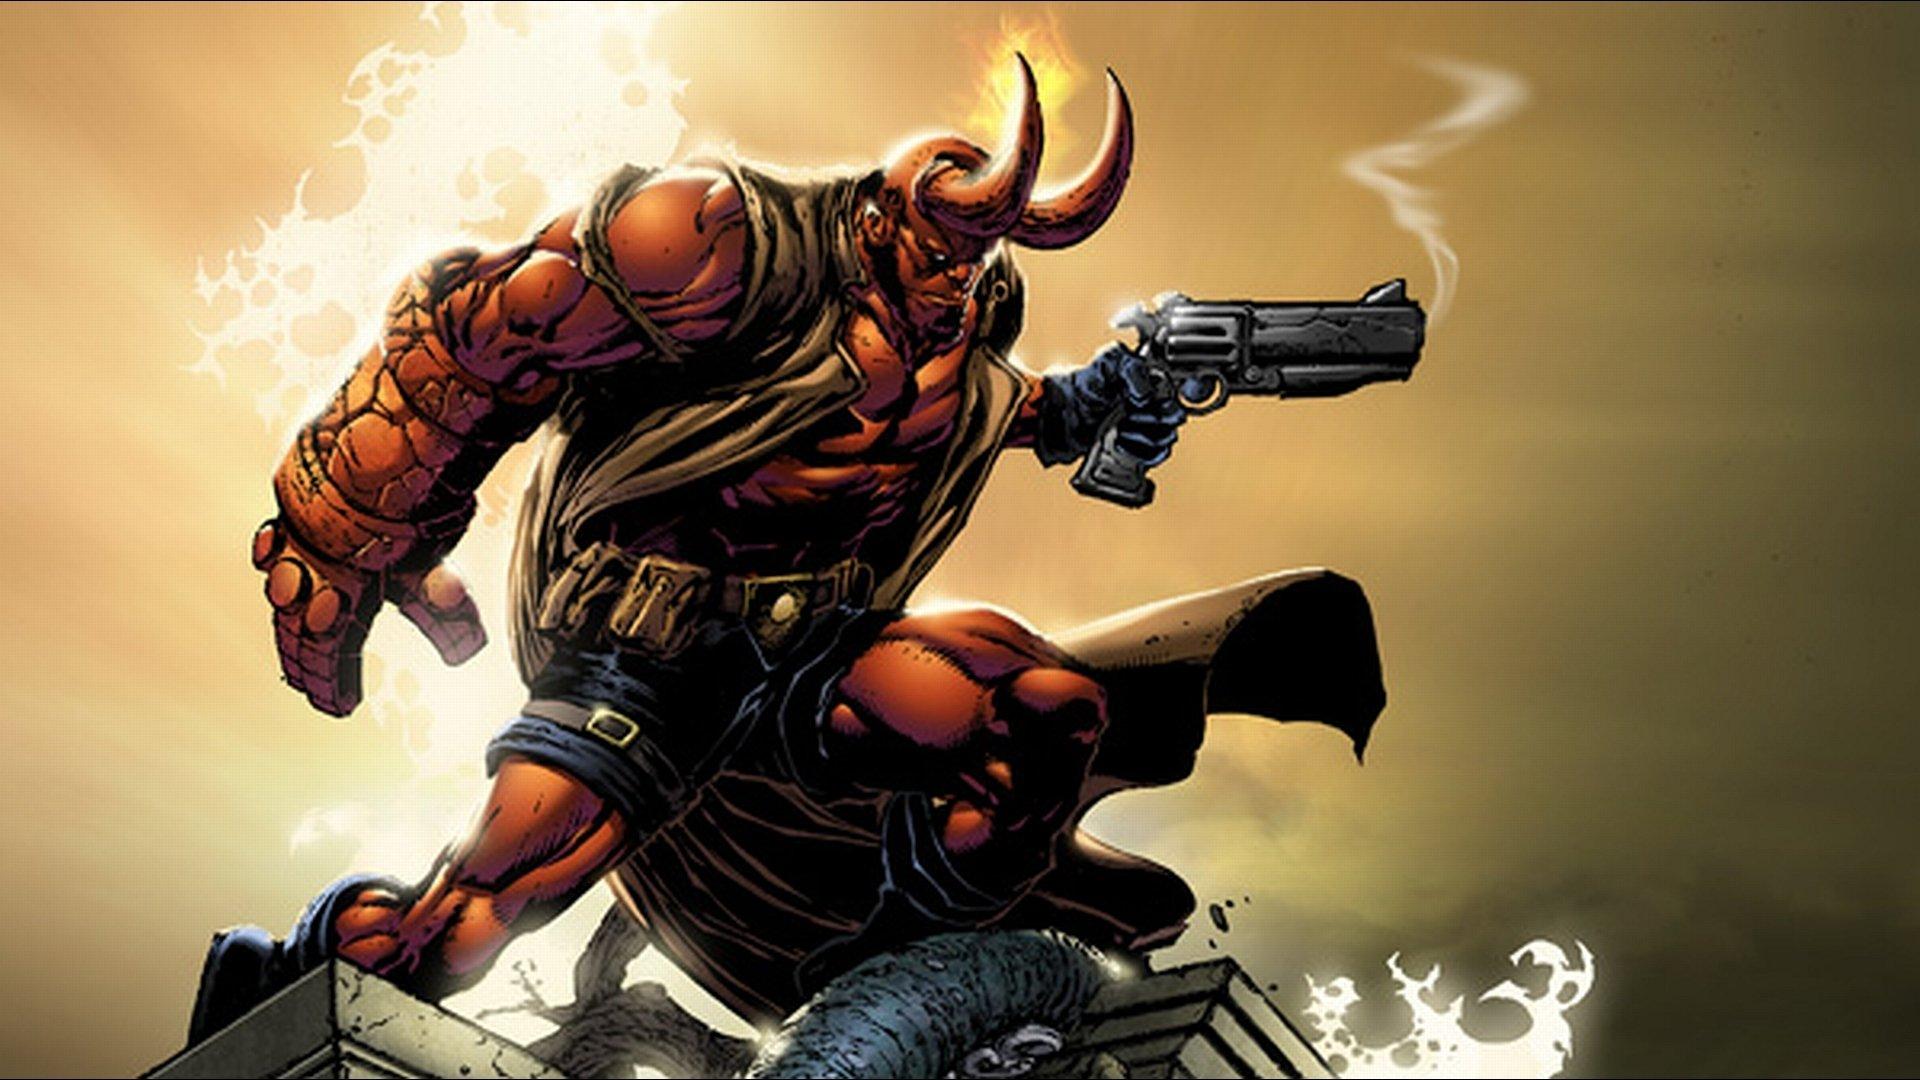 179 Hellboy Fonds D Ecran Hd Arriere Plans Wallpaper Abyss